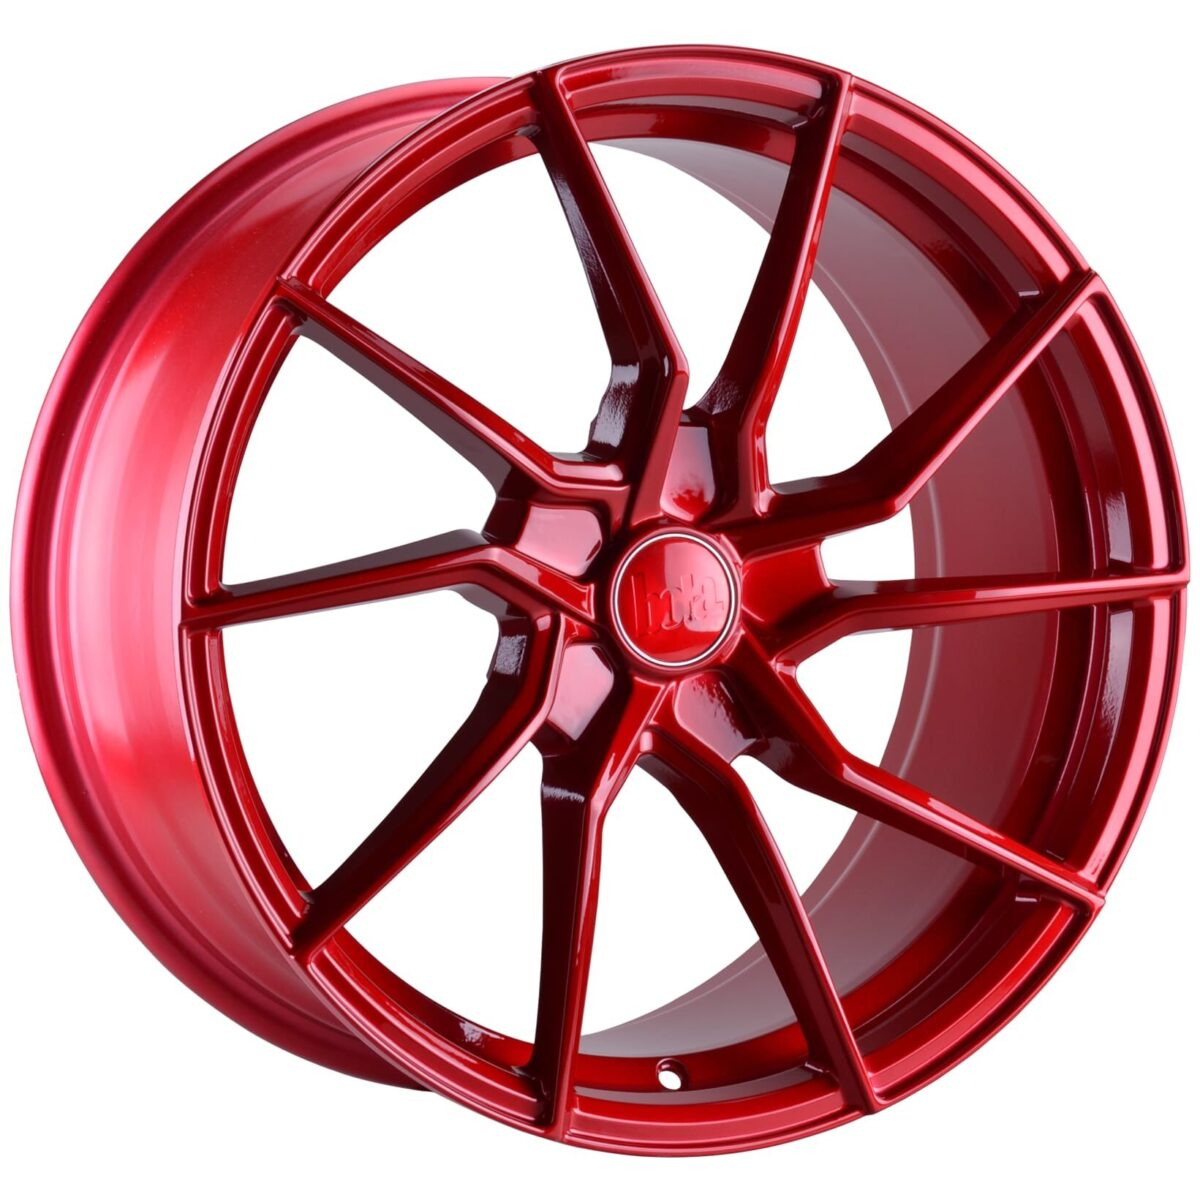 "18"" BOLA B25 Wheels - Candy Red - VW / Audi / Mercedes - 5x112"